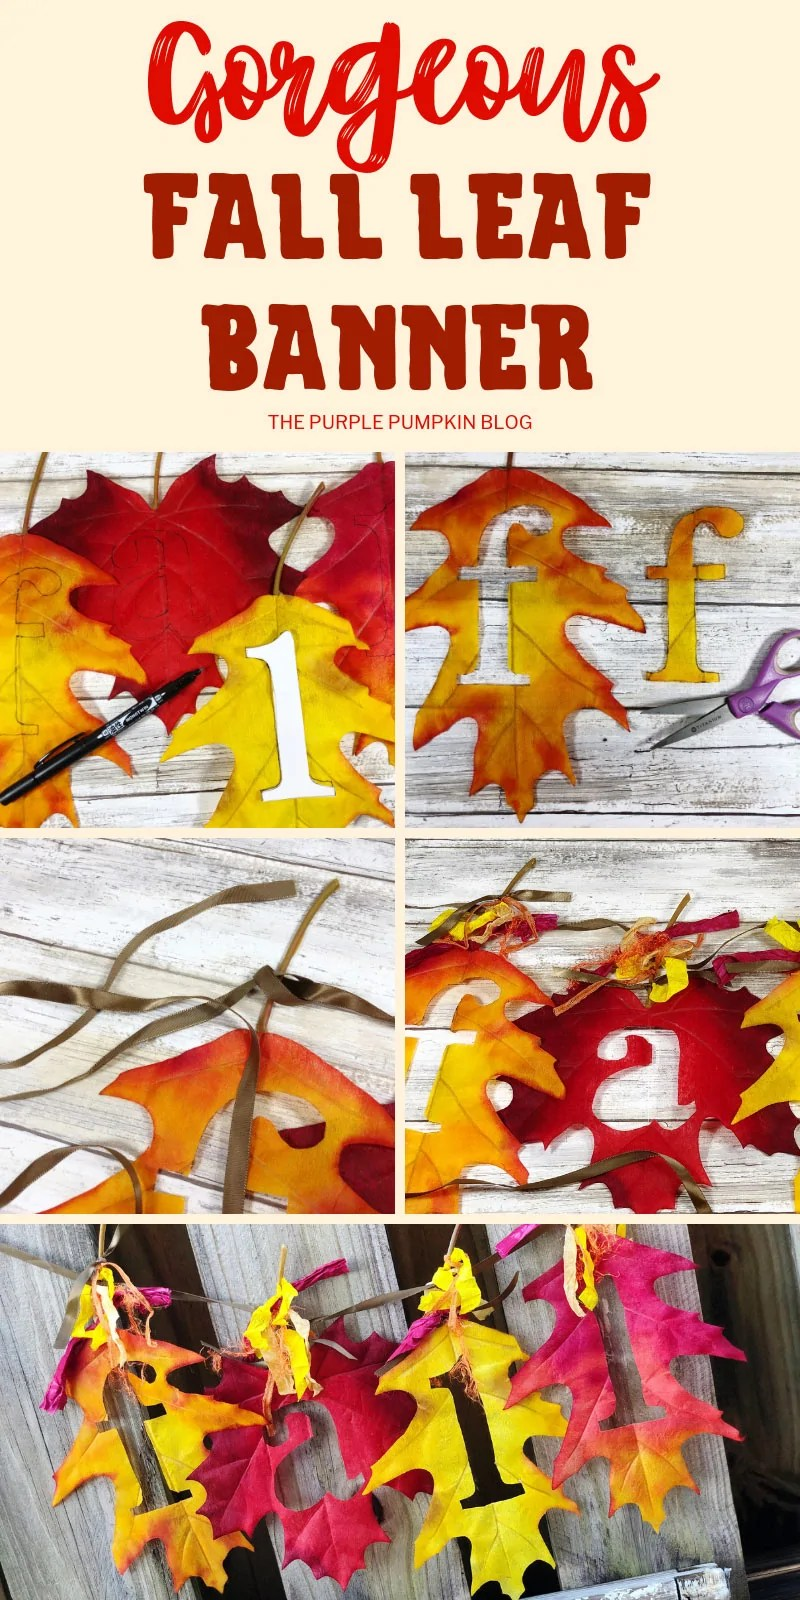 Gorgeous Fall Leaf Banner